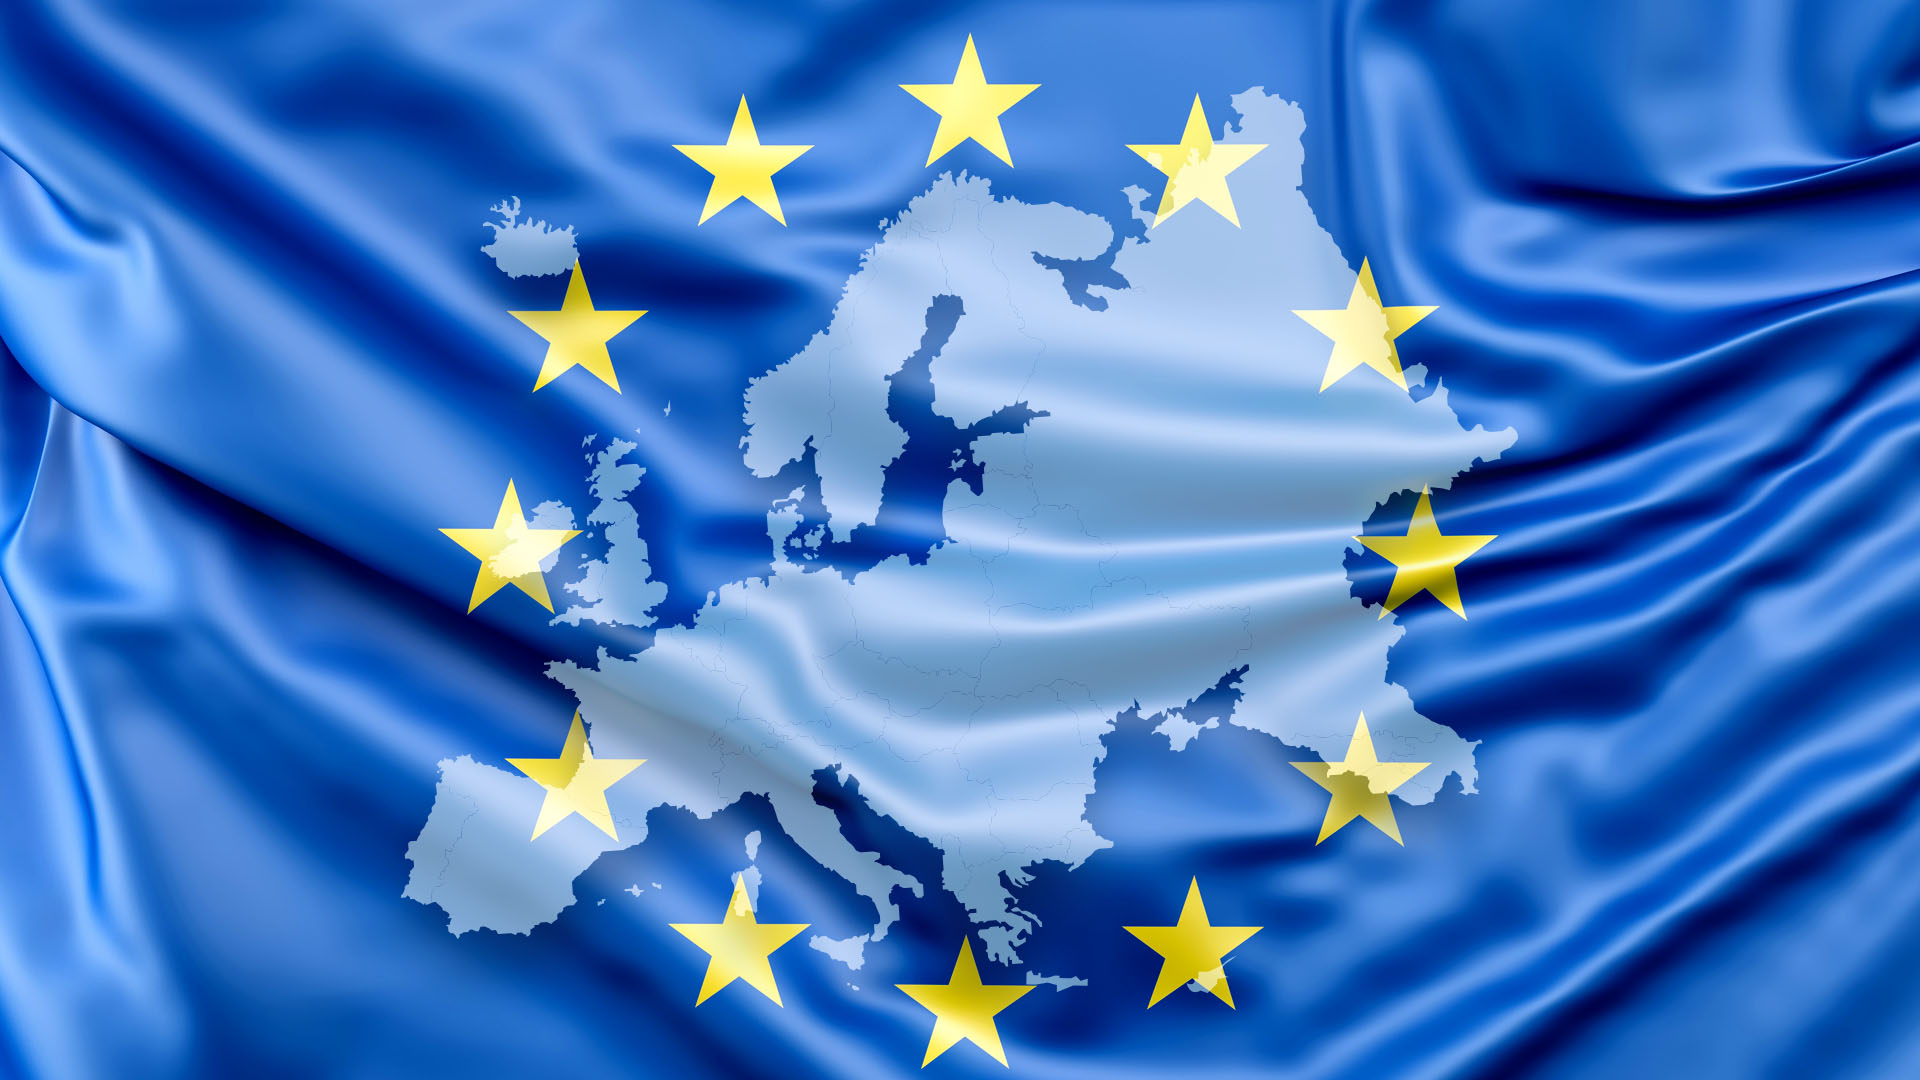 Európske ozbrojené sily a zbory – návrat Wehrmachtu pod názvom EuroWehrmacht?